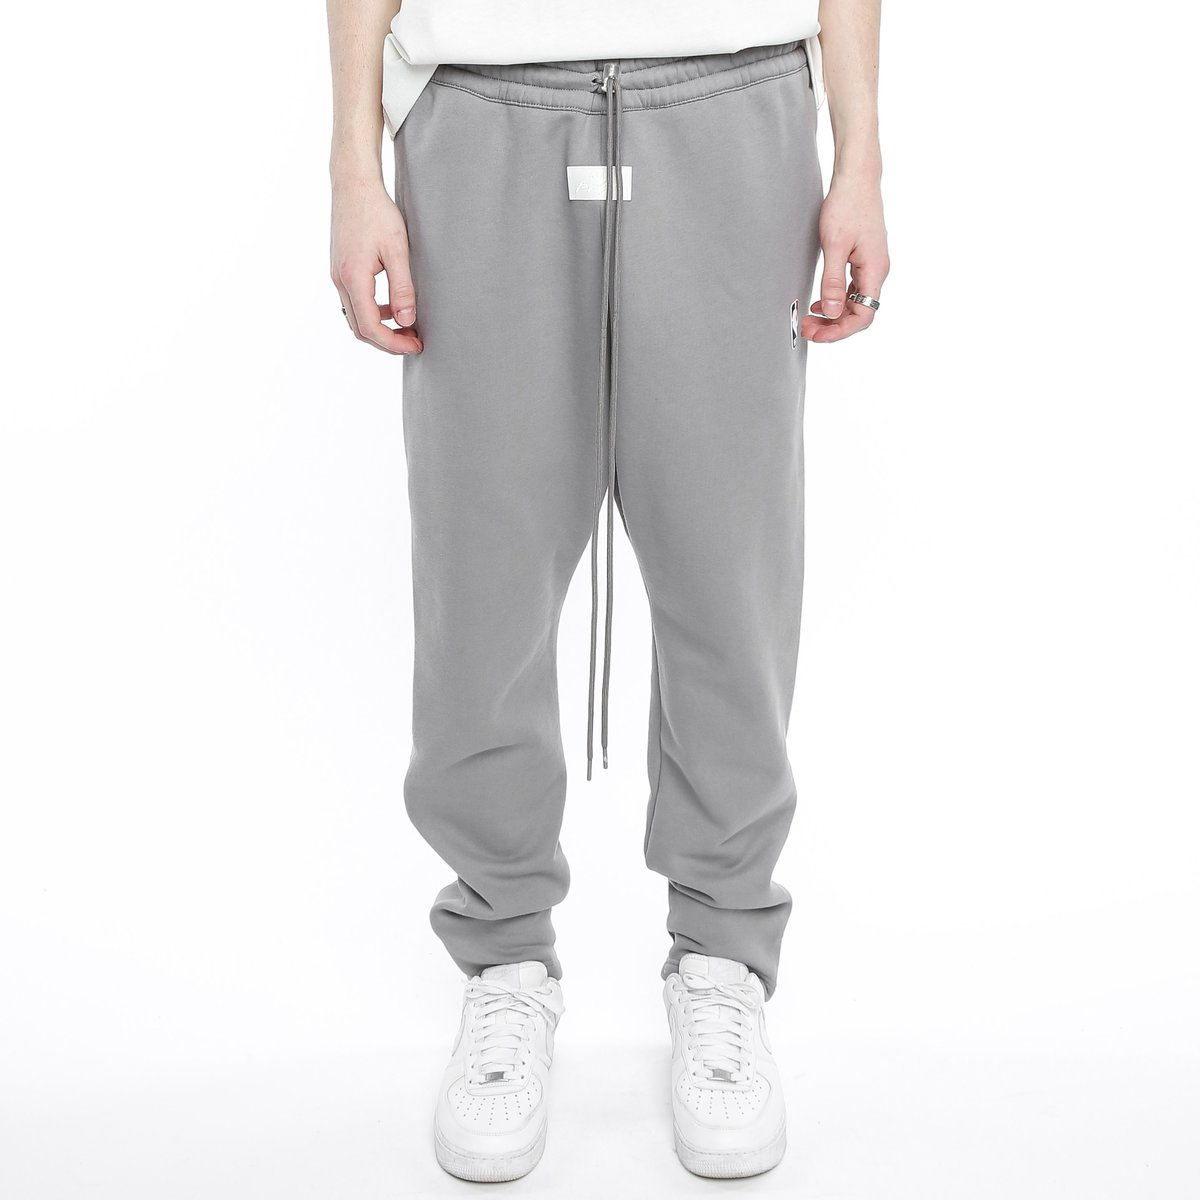 Fear of God NBA Tearaway Pants | Garmentory